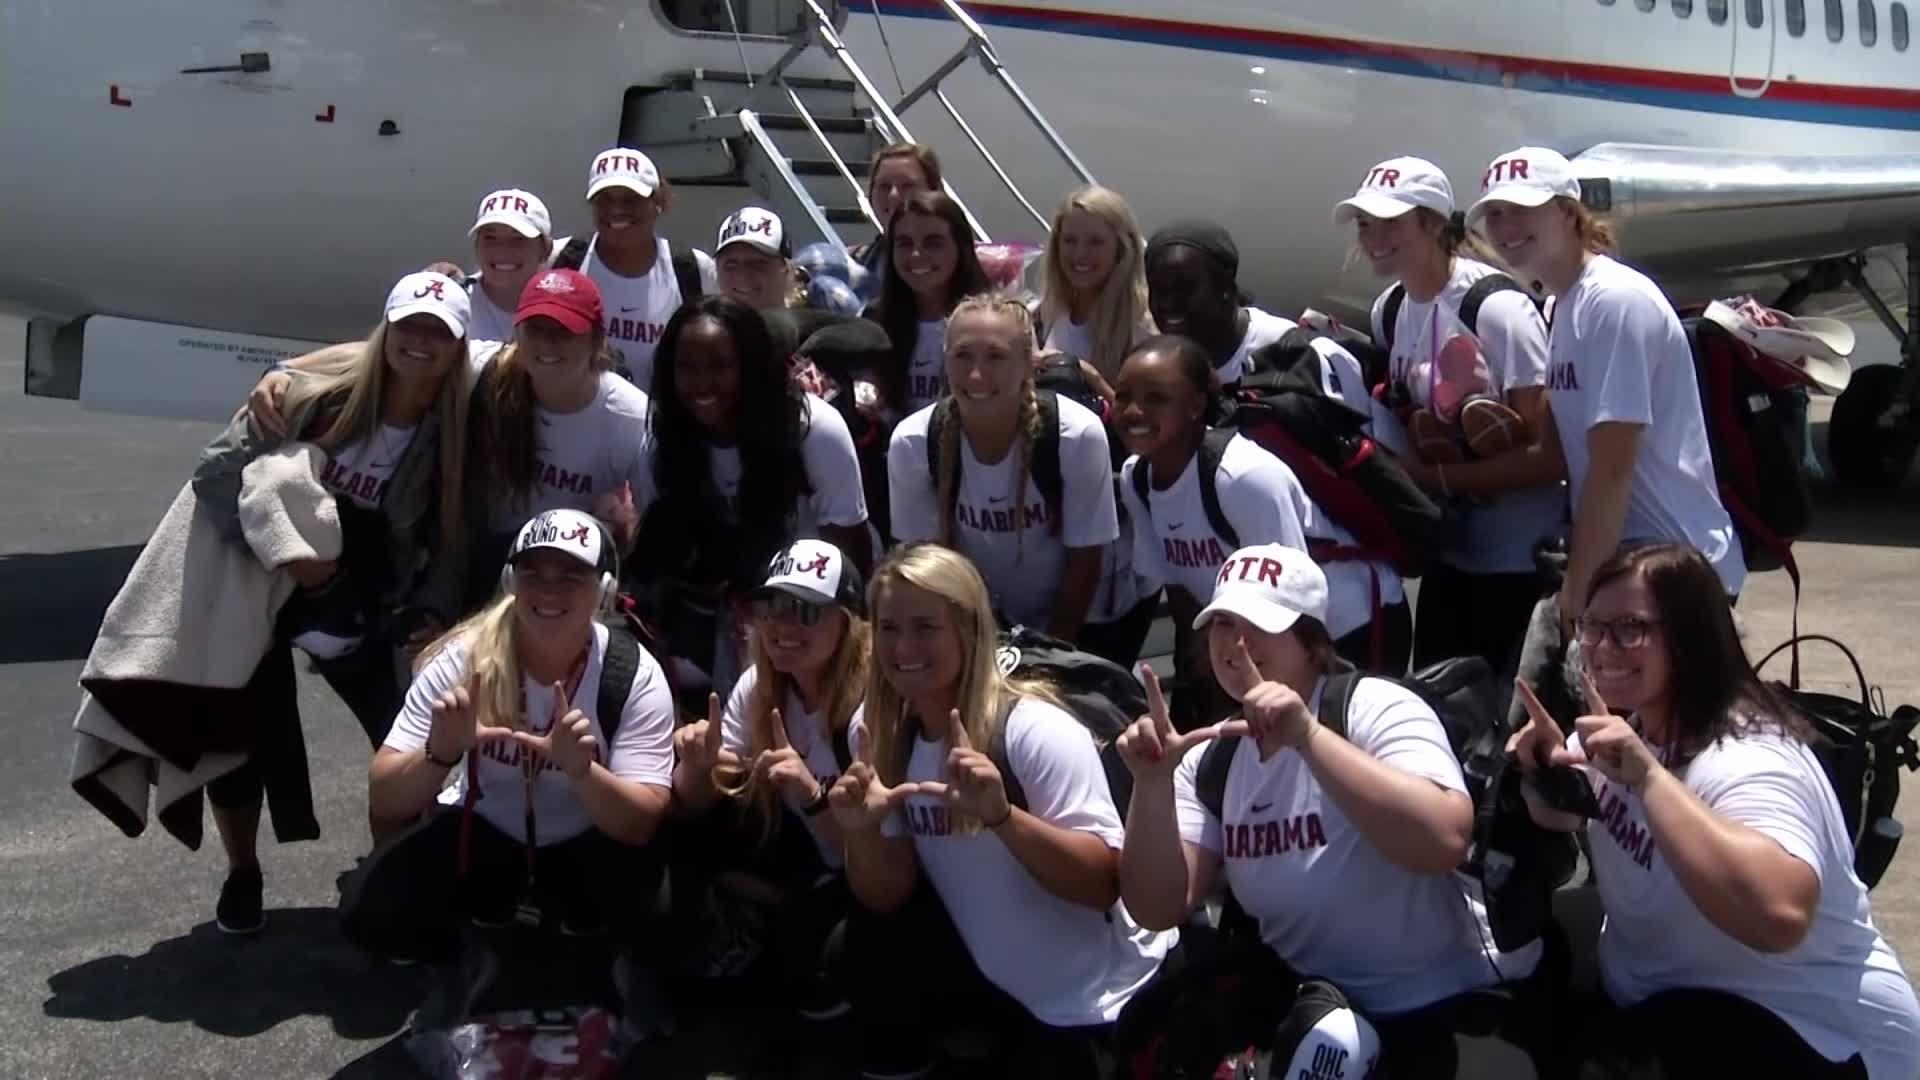 Alabama_Softball_departs_for_Women_s_Col_4_20190528203917